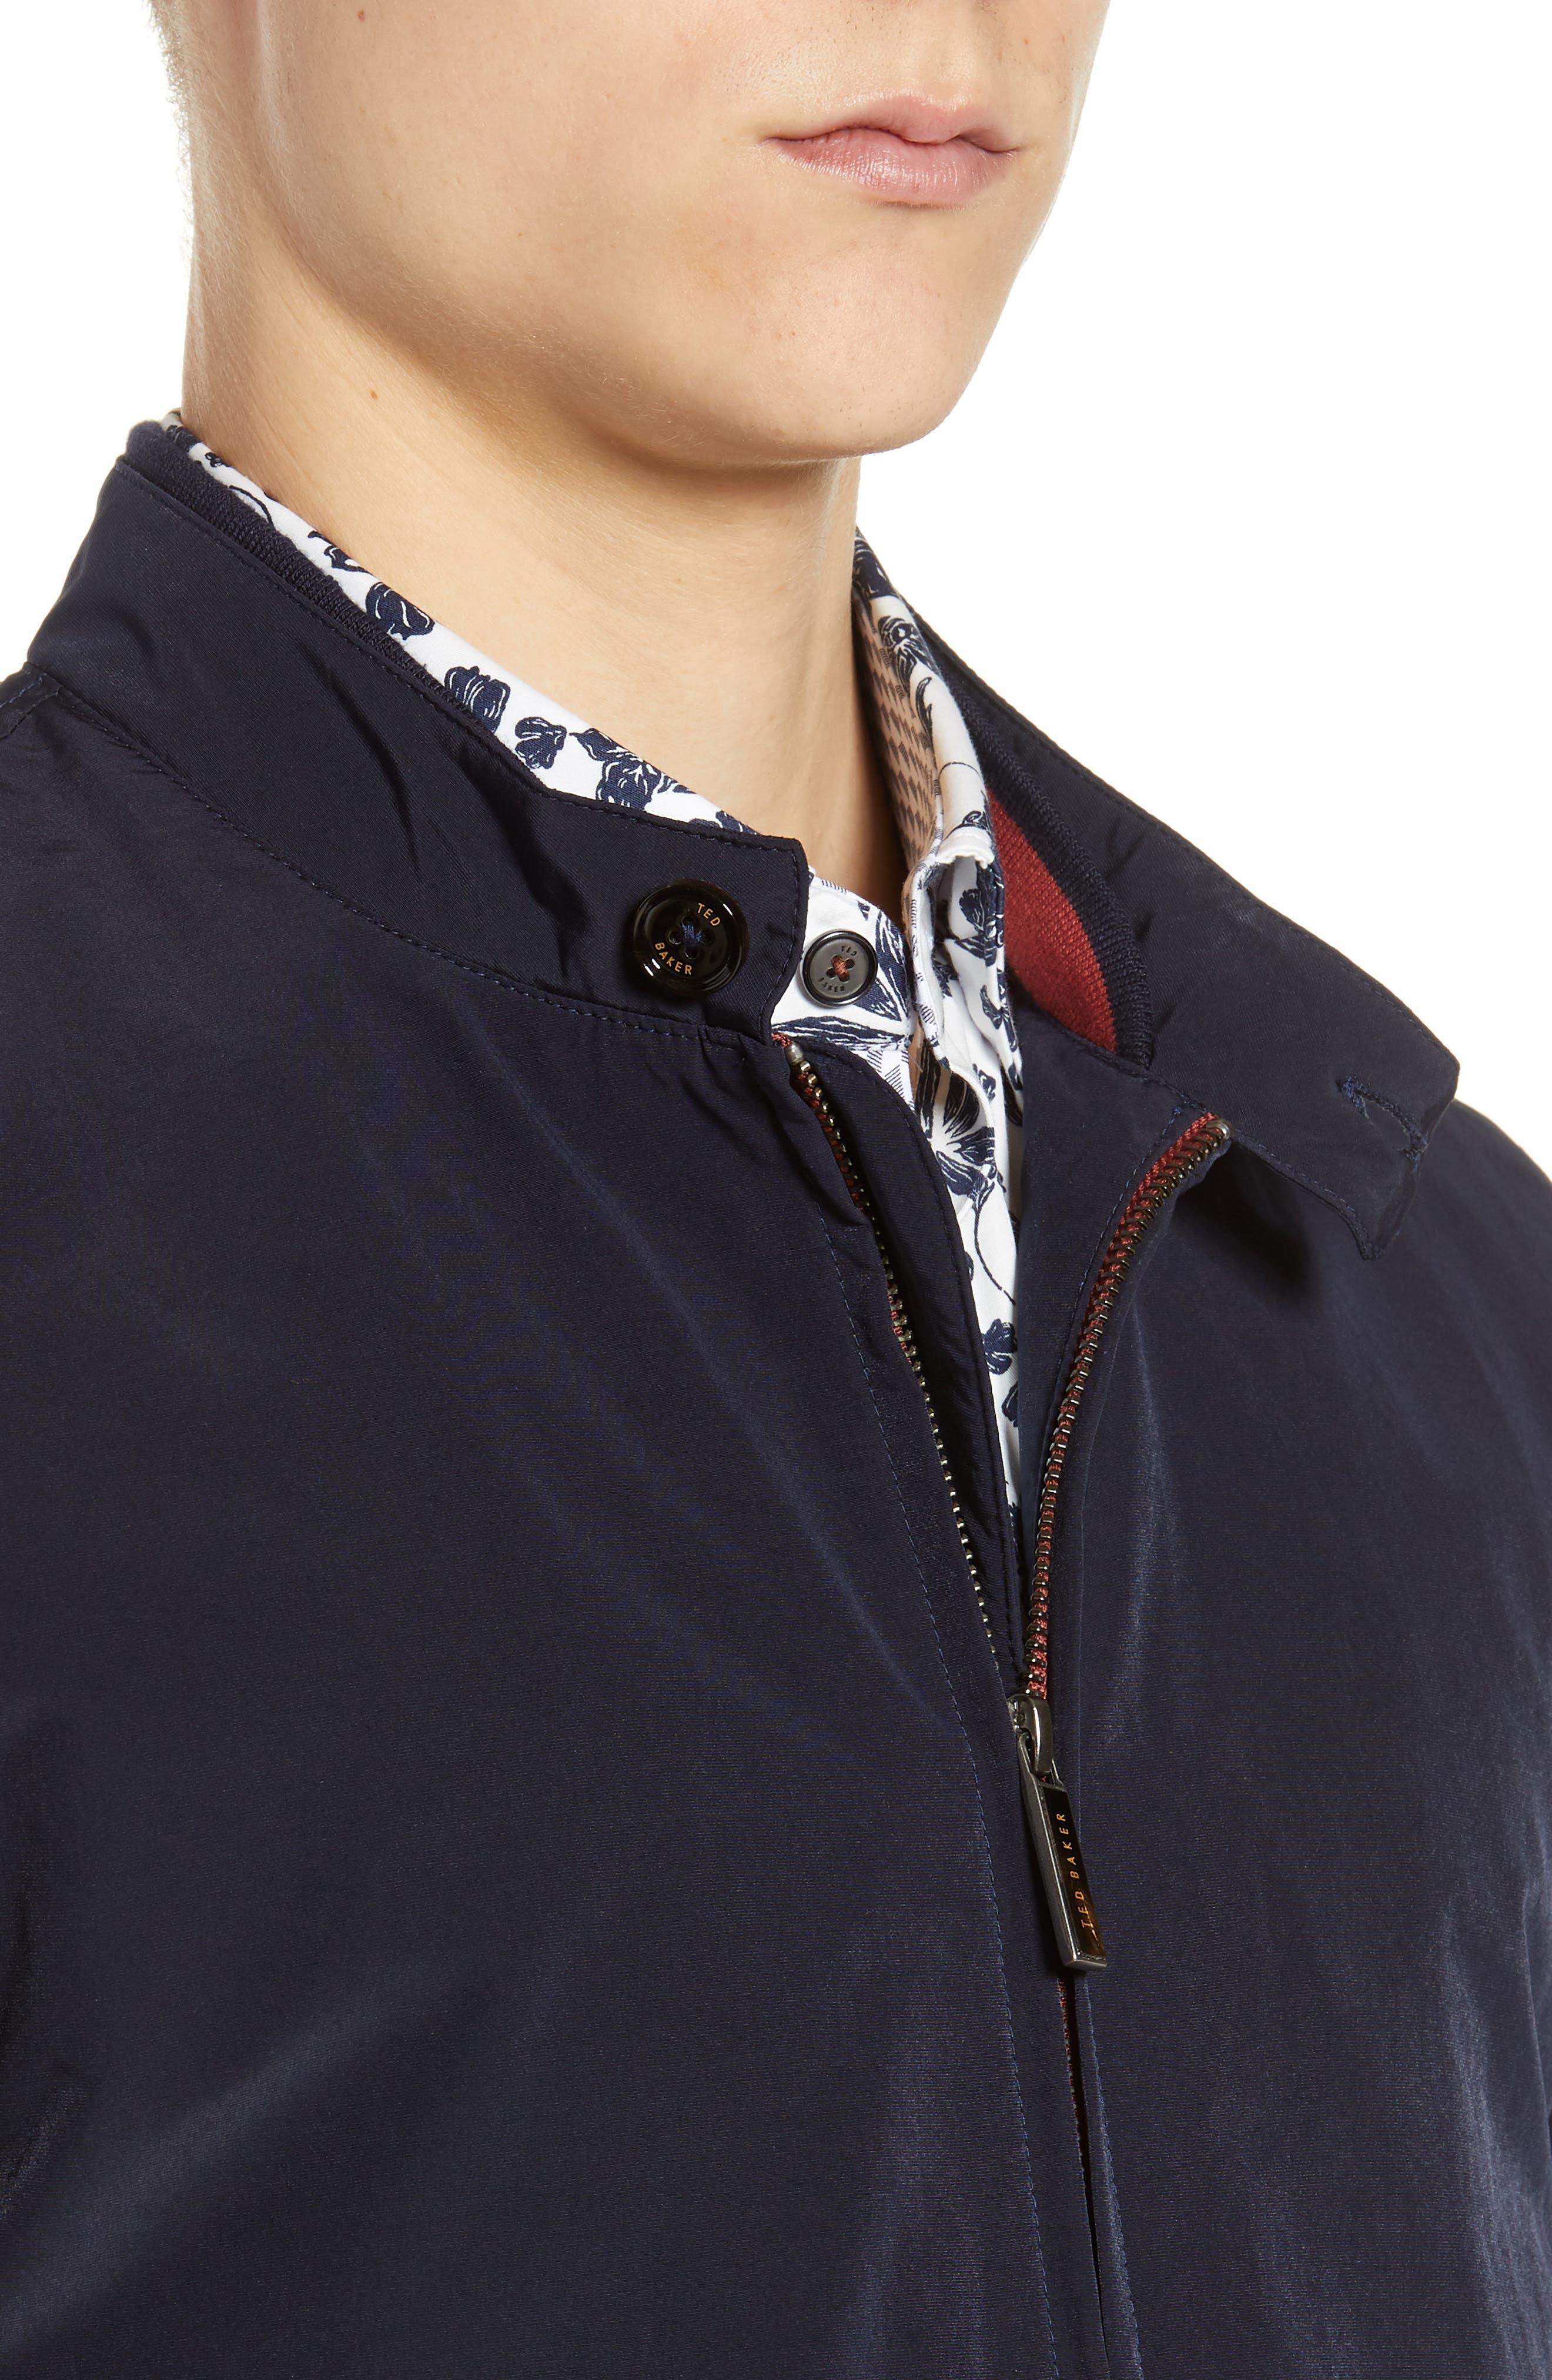 TED BAKER LONDON, Aroma Slim Fit Bomber Jacket, Alternate thumbnail 5, color, NAVY